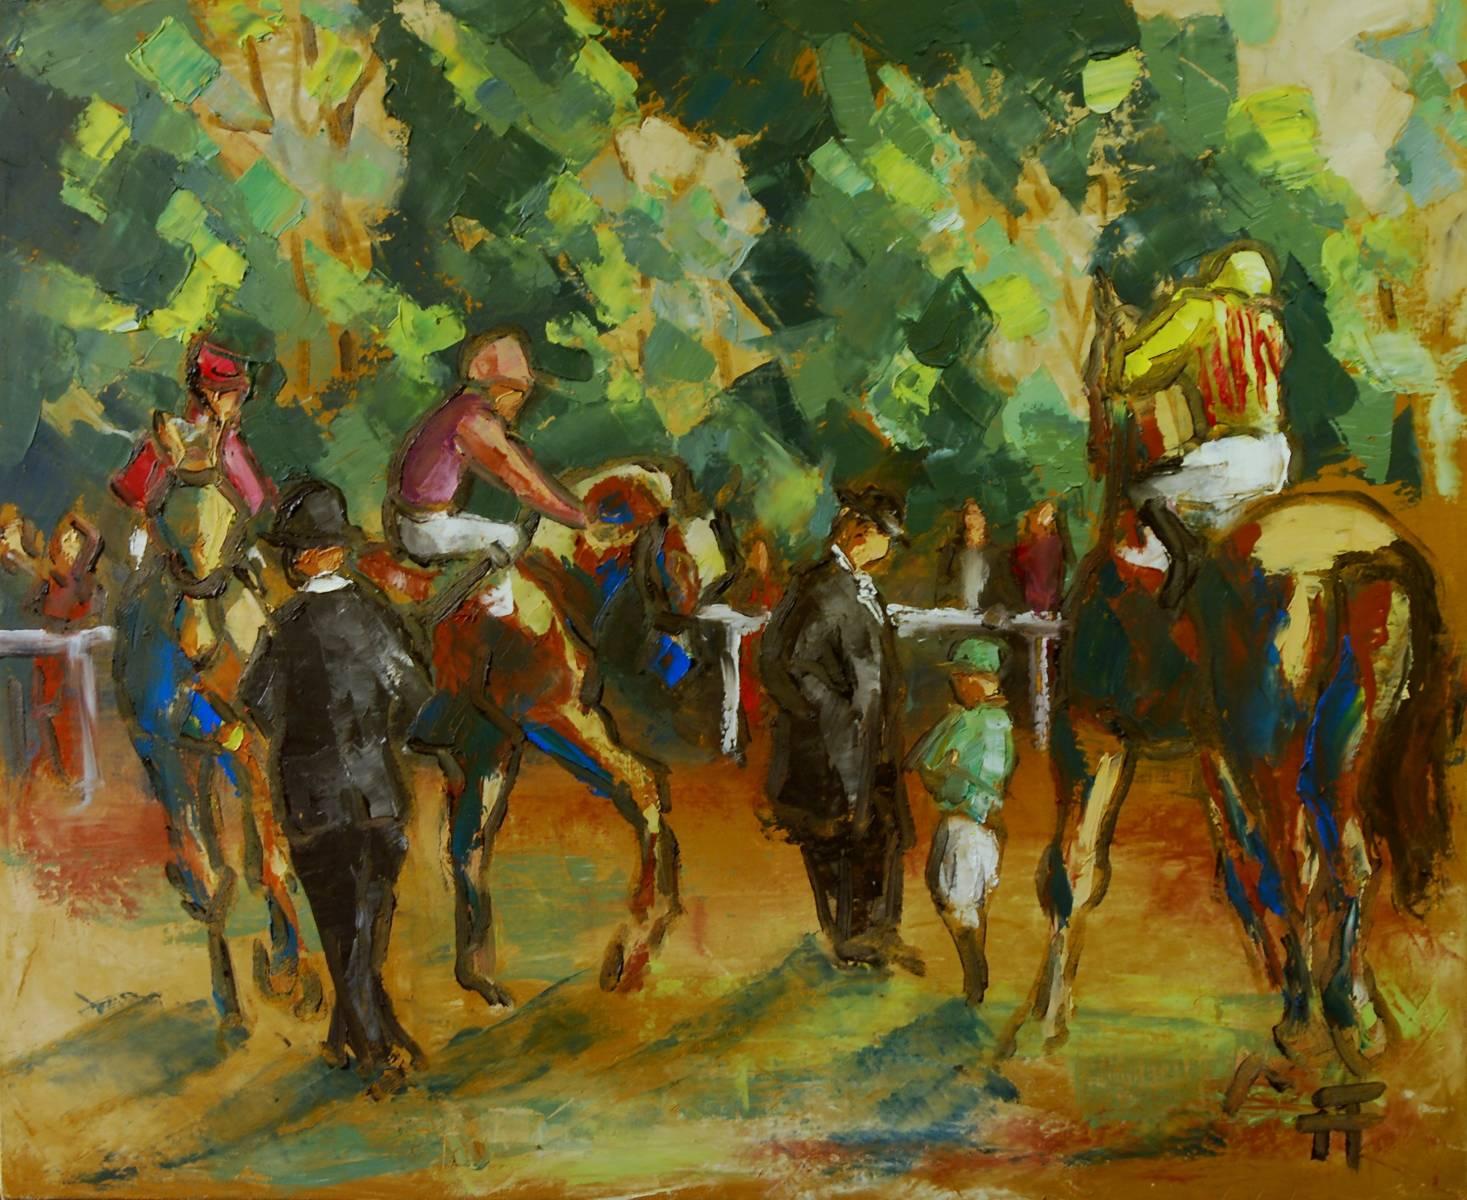 20-16-paddock 3 chevaux-73 x 60